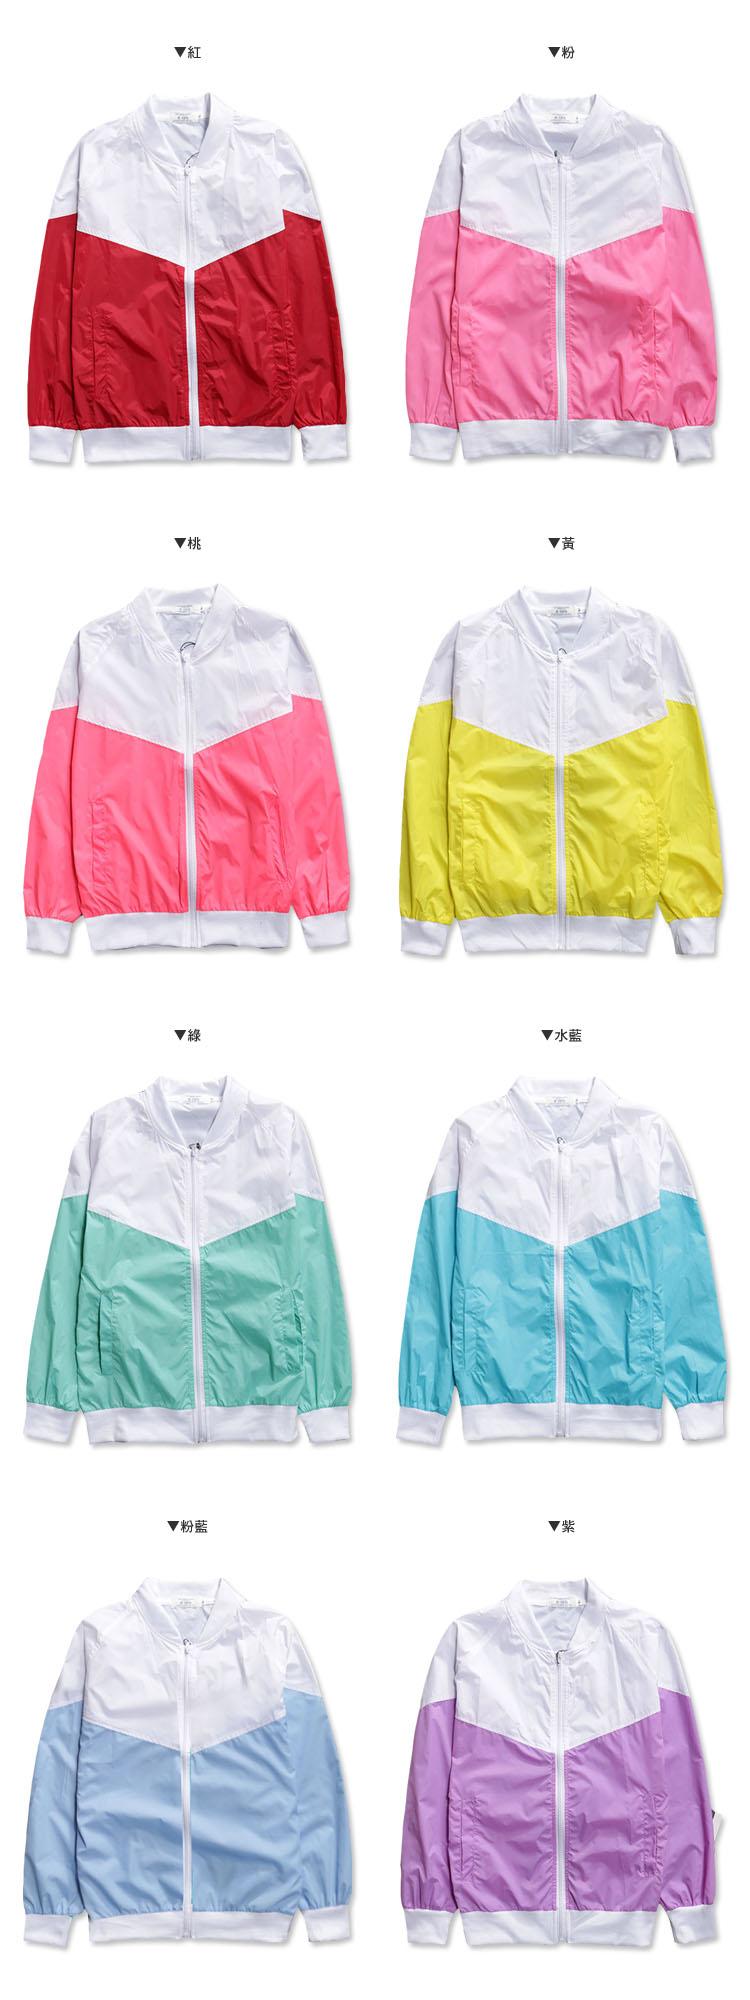 ☆BOY-2☆【NQ98003】情侶韓版配色風衣外套 2